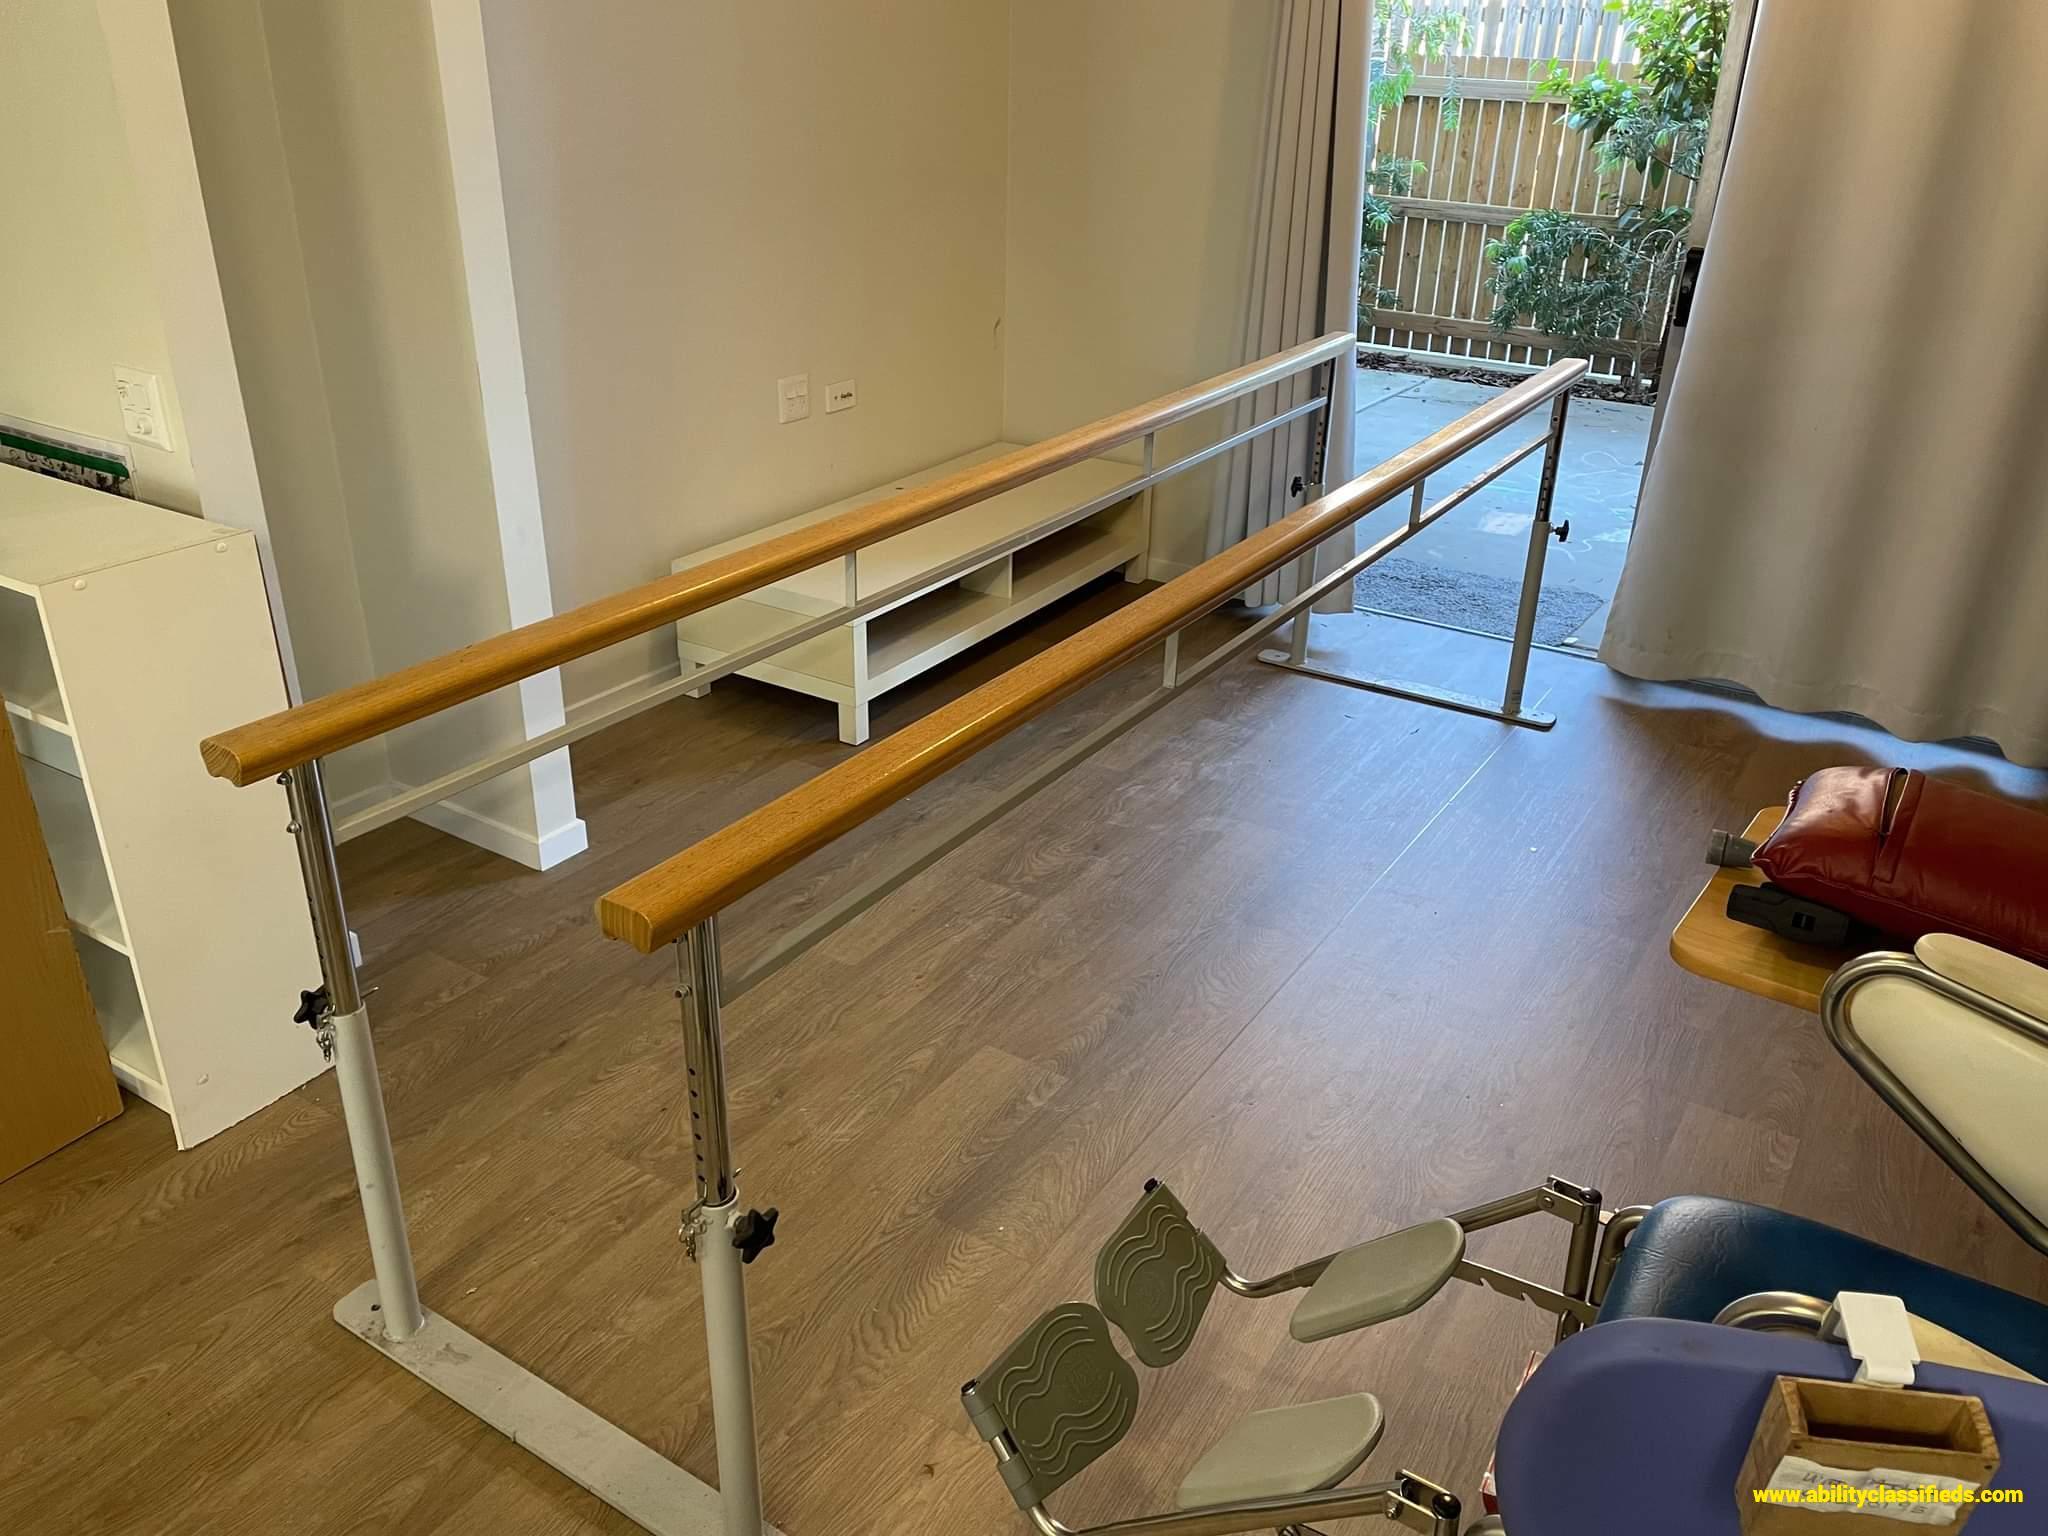 Multiple items, see description. Wheelchair, bed, sara steady...